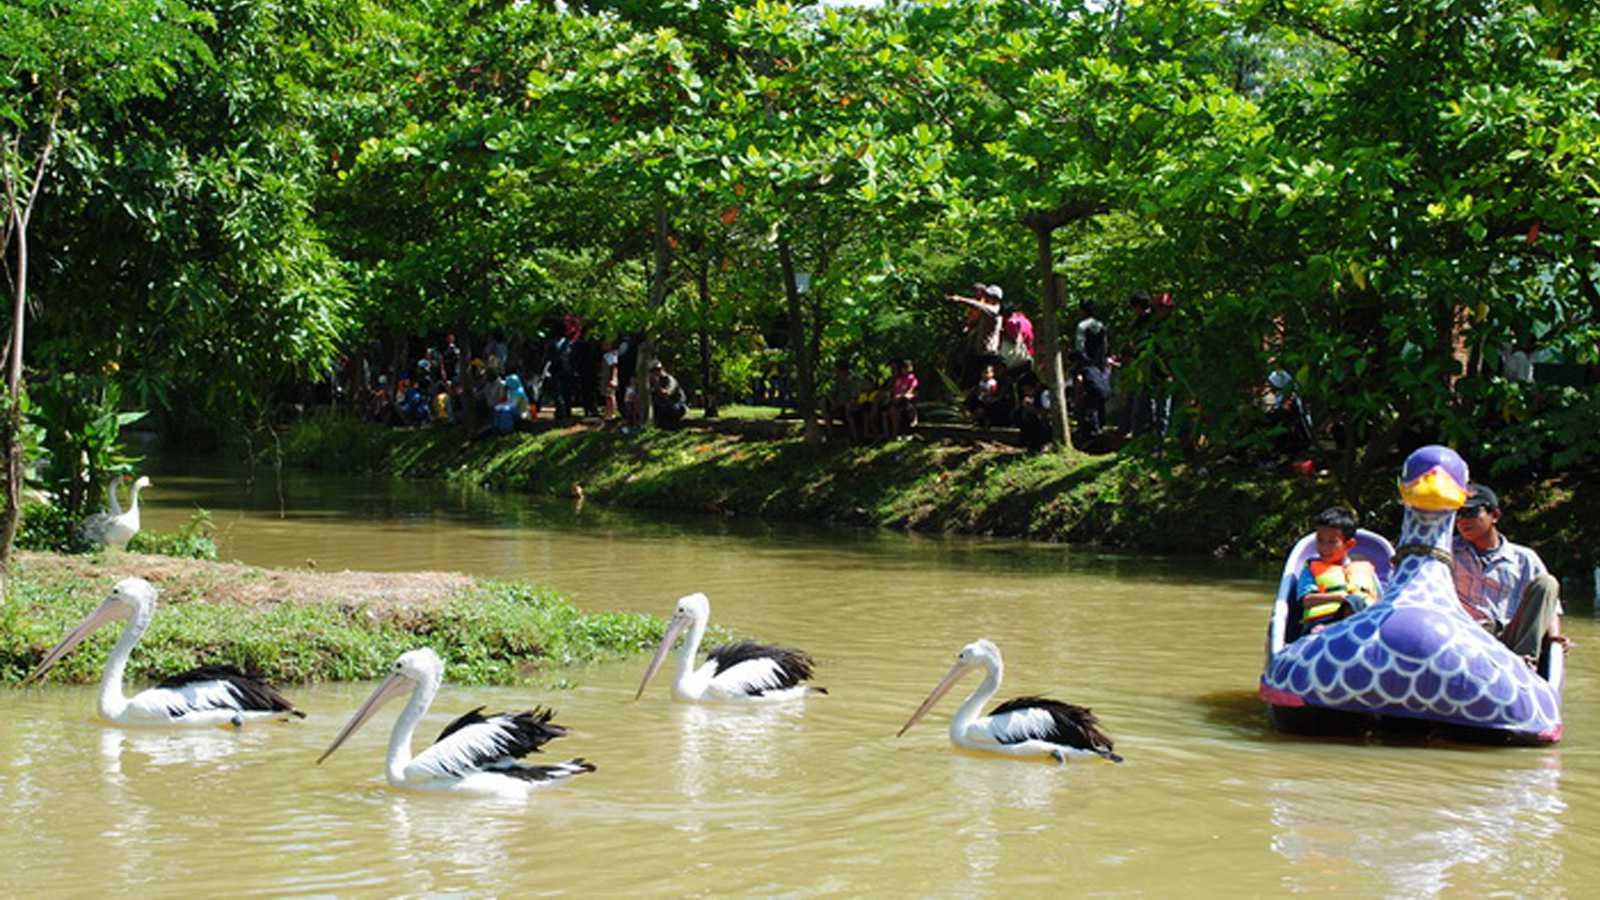 Tempat wisata di Semarang - Kebun Binatang Mangkang